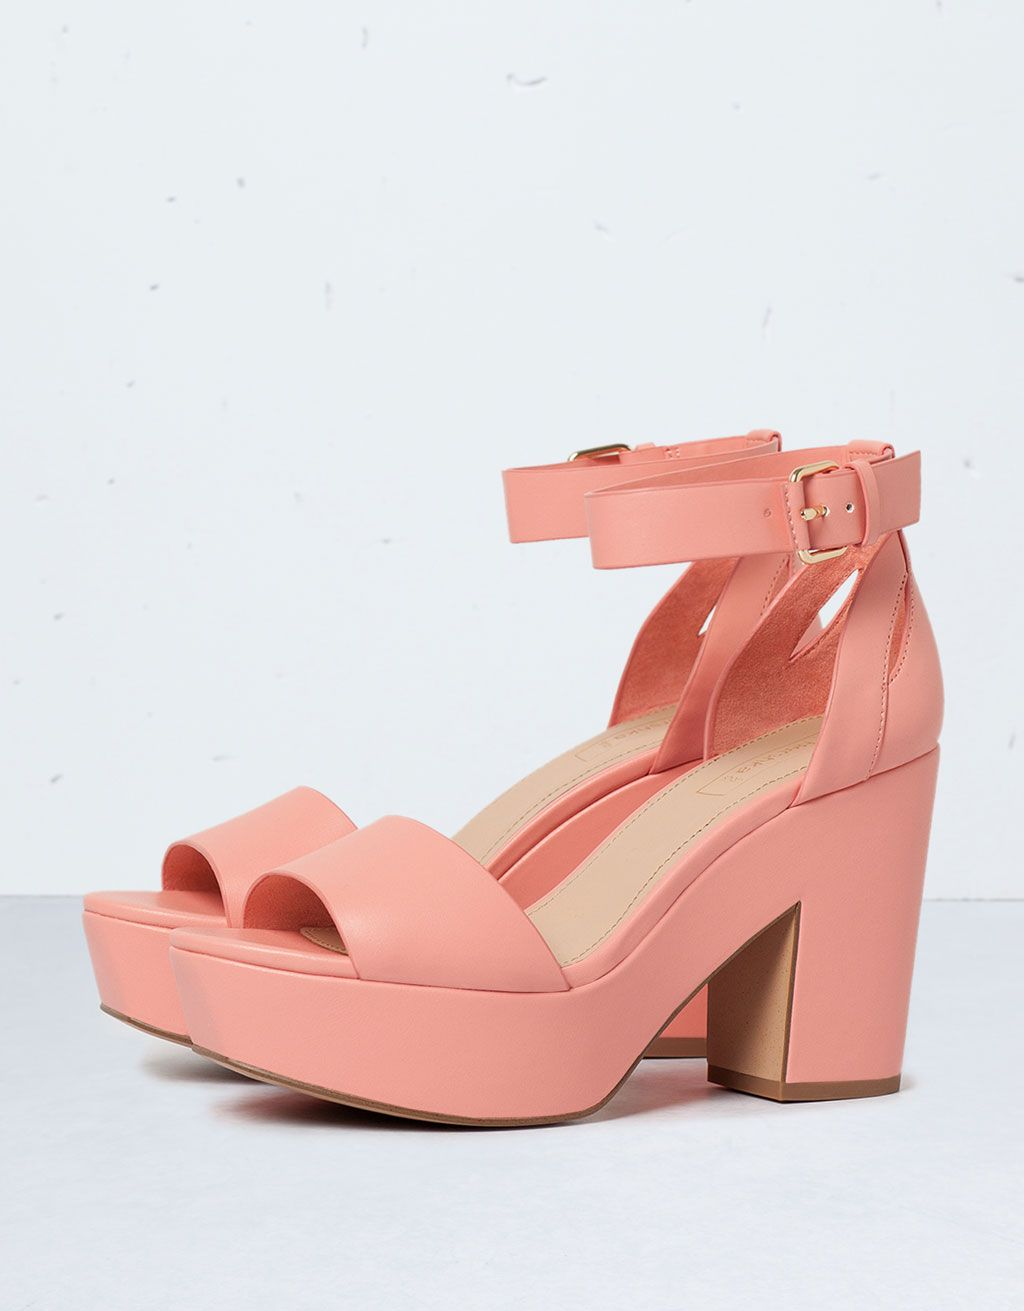 d58e546a585b Bershka medium heel sandals - Shoes - Bershka Serbia